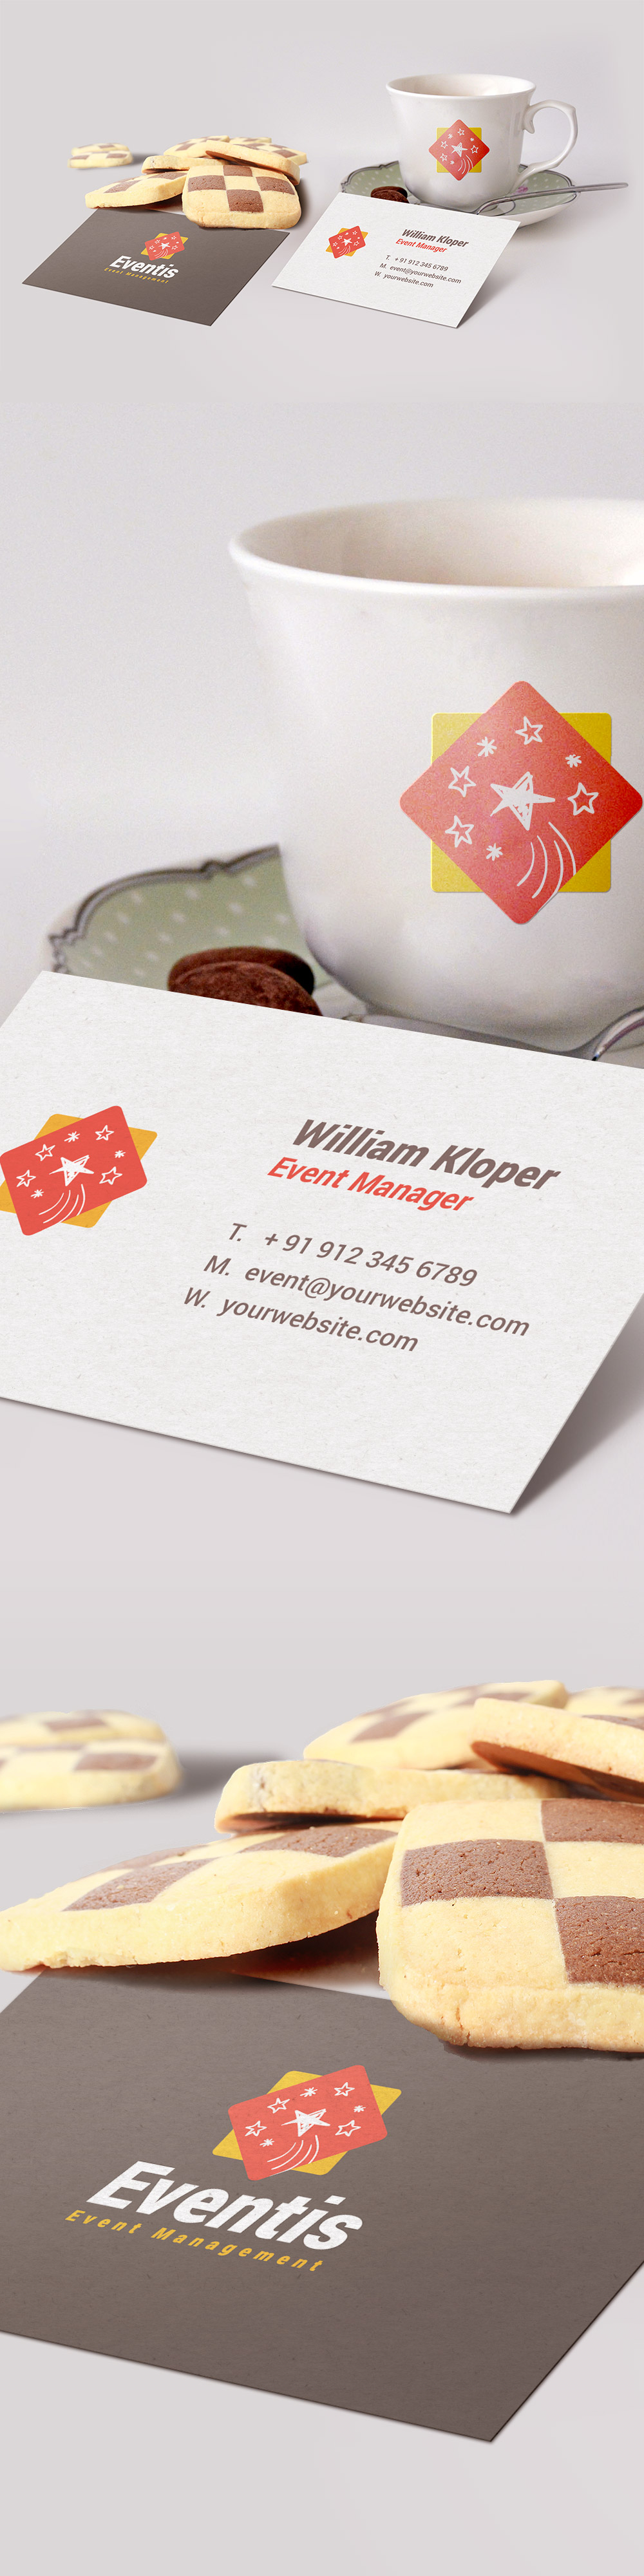 Business Card Coffee Cup Scene Mockup PSD